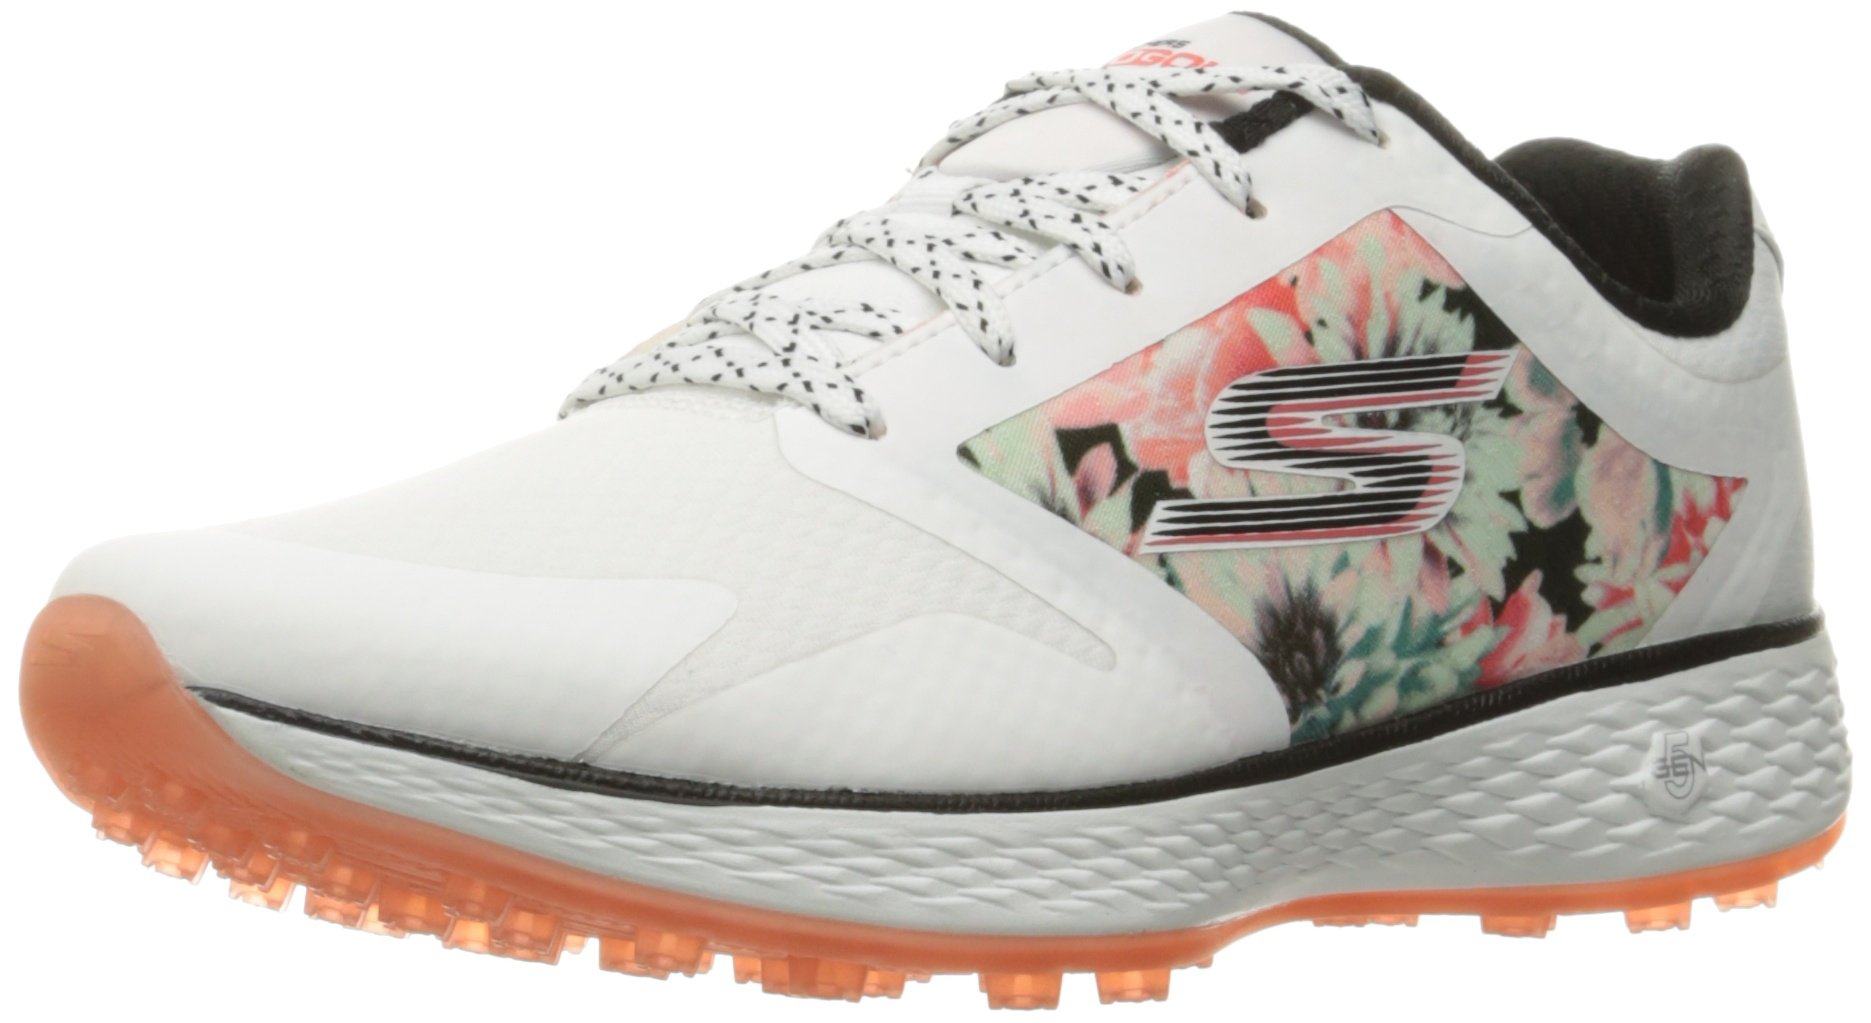 Skechers Performance Women's Go Golf Birdie Tropic Golf Shoe, White/Multi Tropic, 11 M US